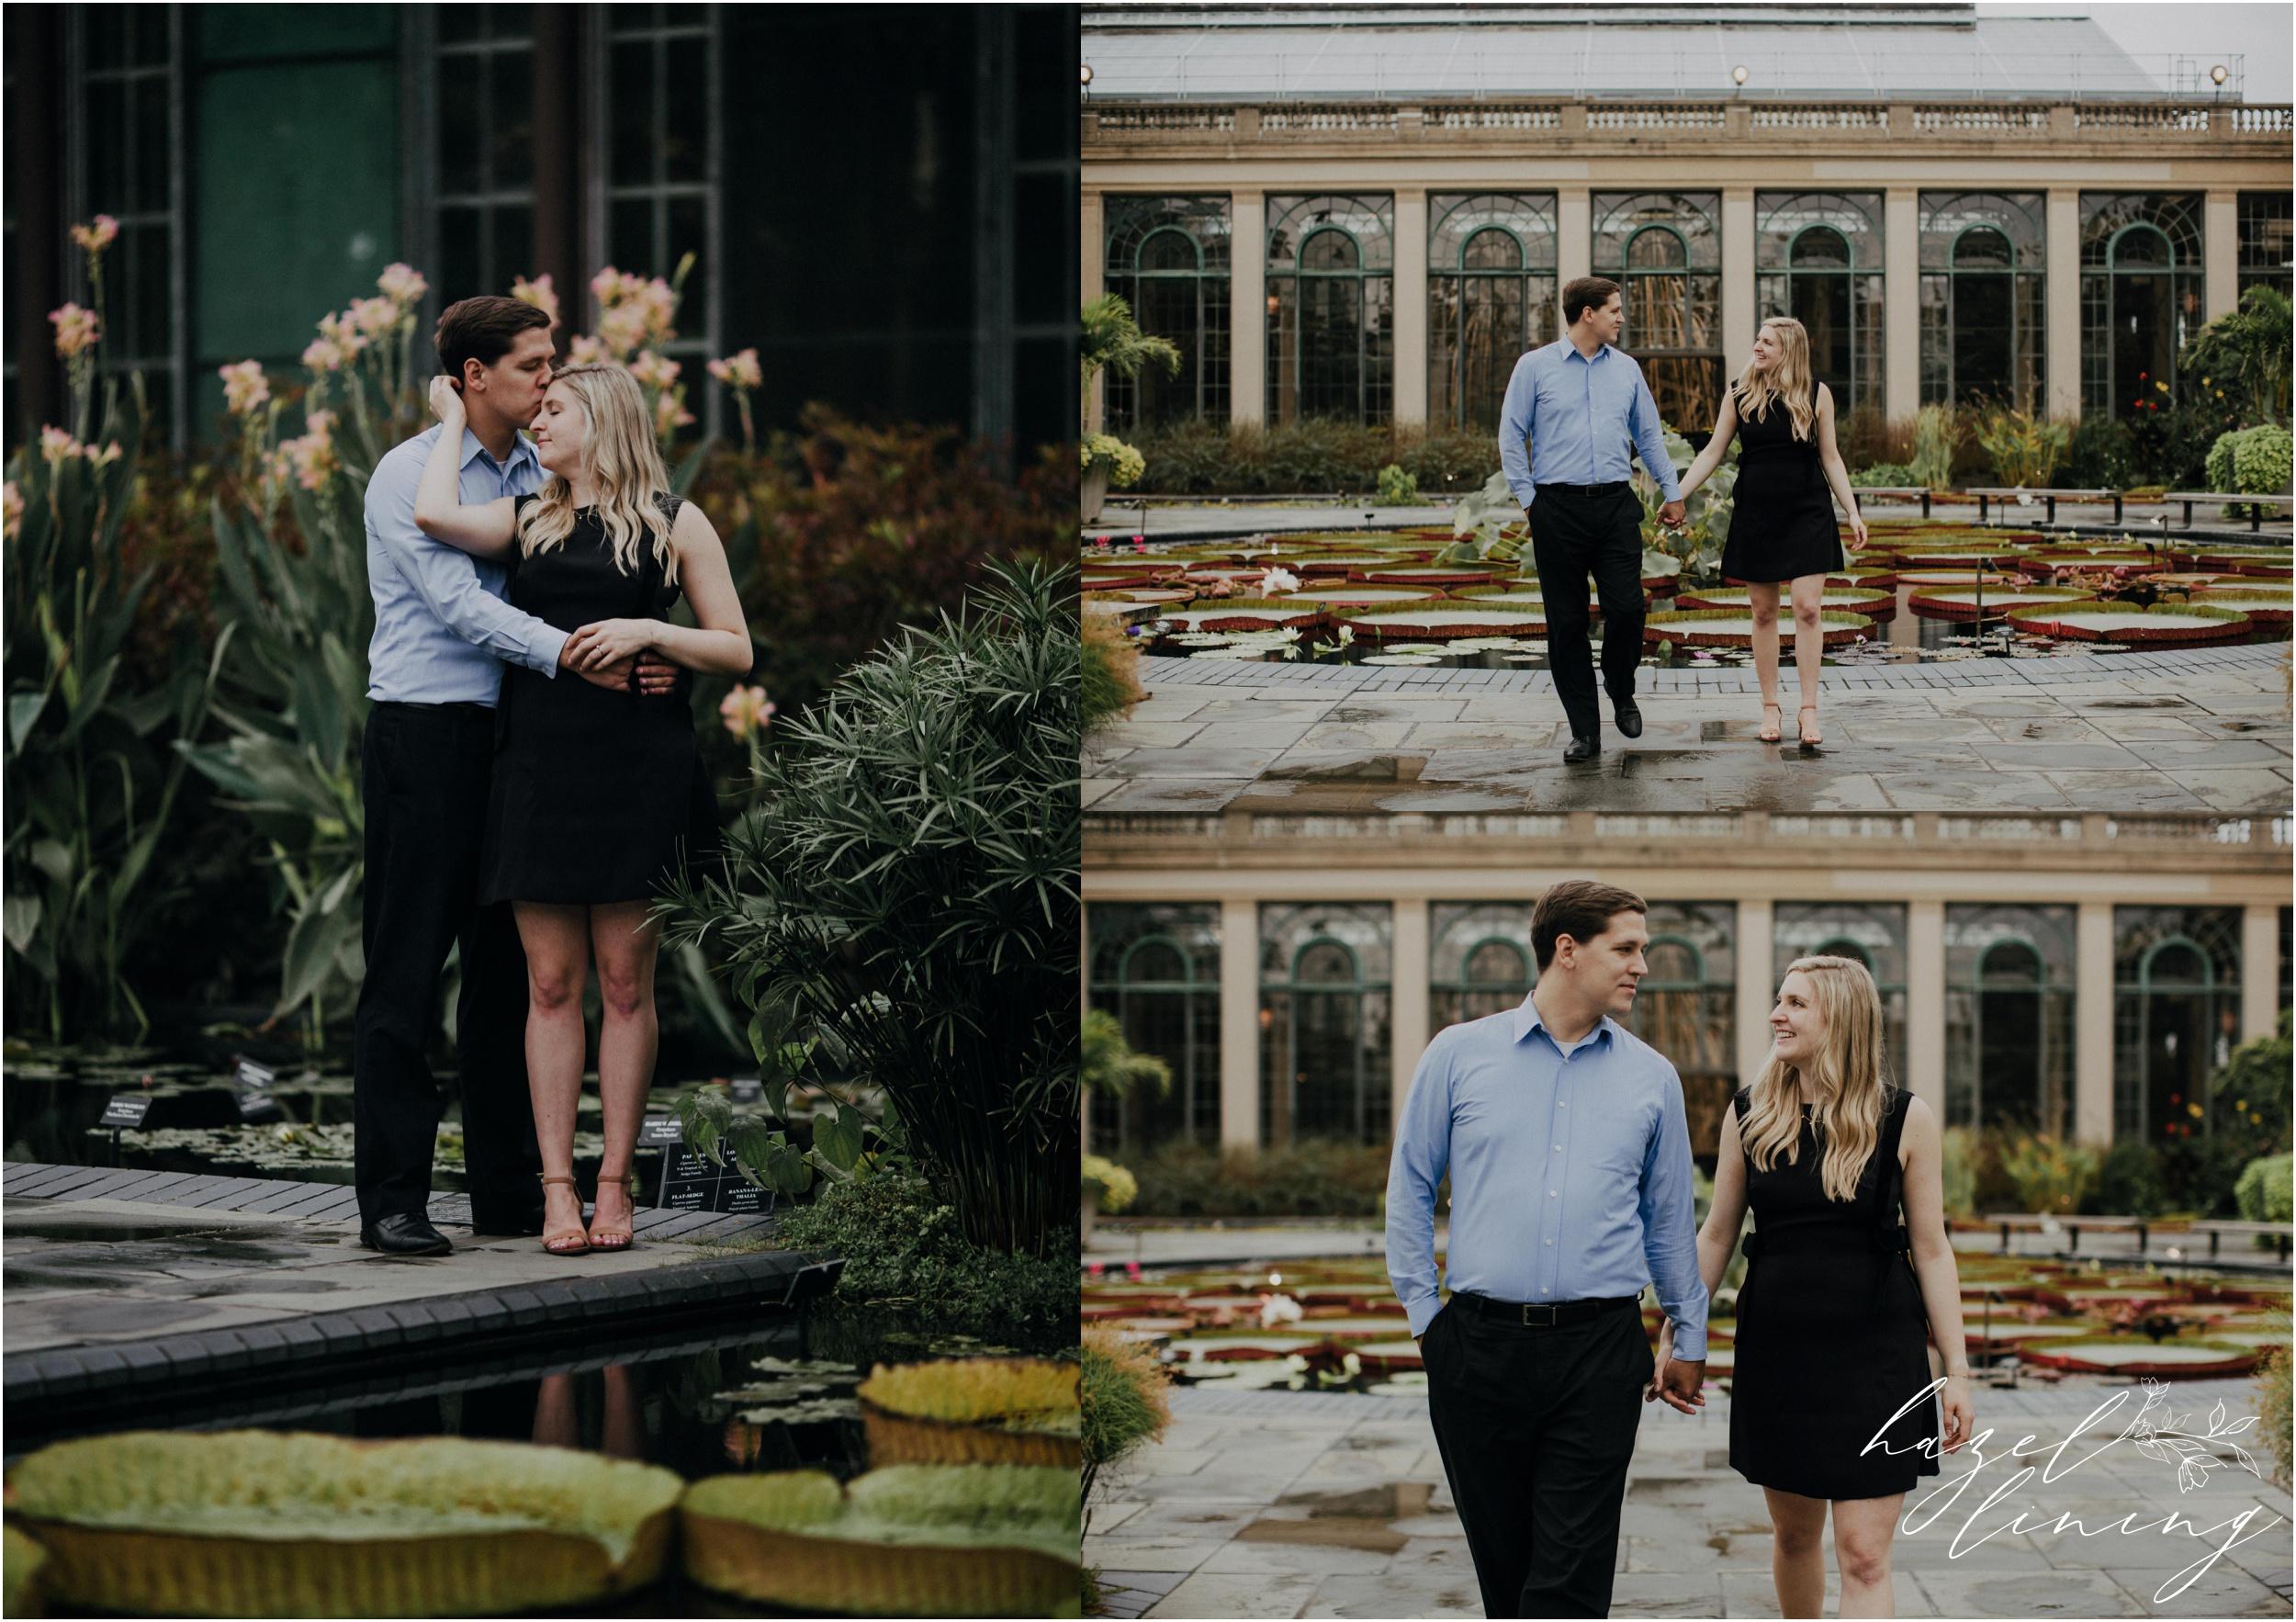 victoria-travis-logan-mayes-longwood-gardens-kennett-square-philadelphia-engagement-session-hazel-lining-photography-destination-elopement-wedding-engagement-photography_0044.jpg